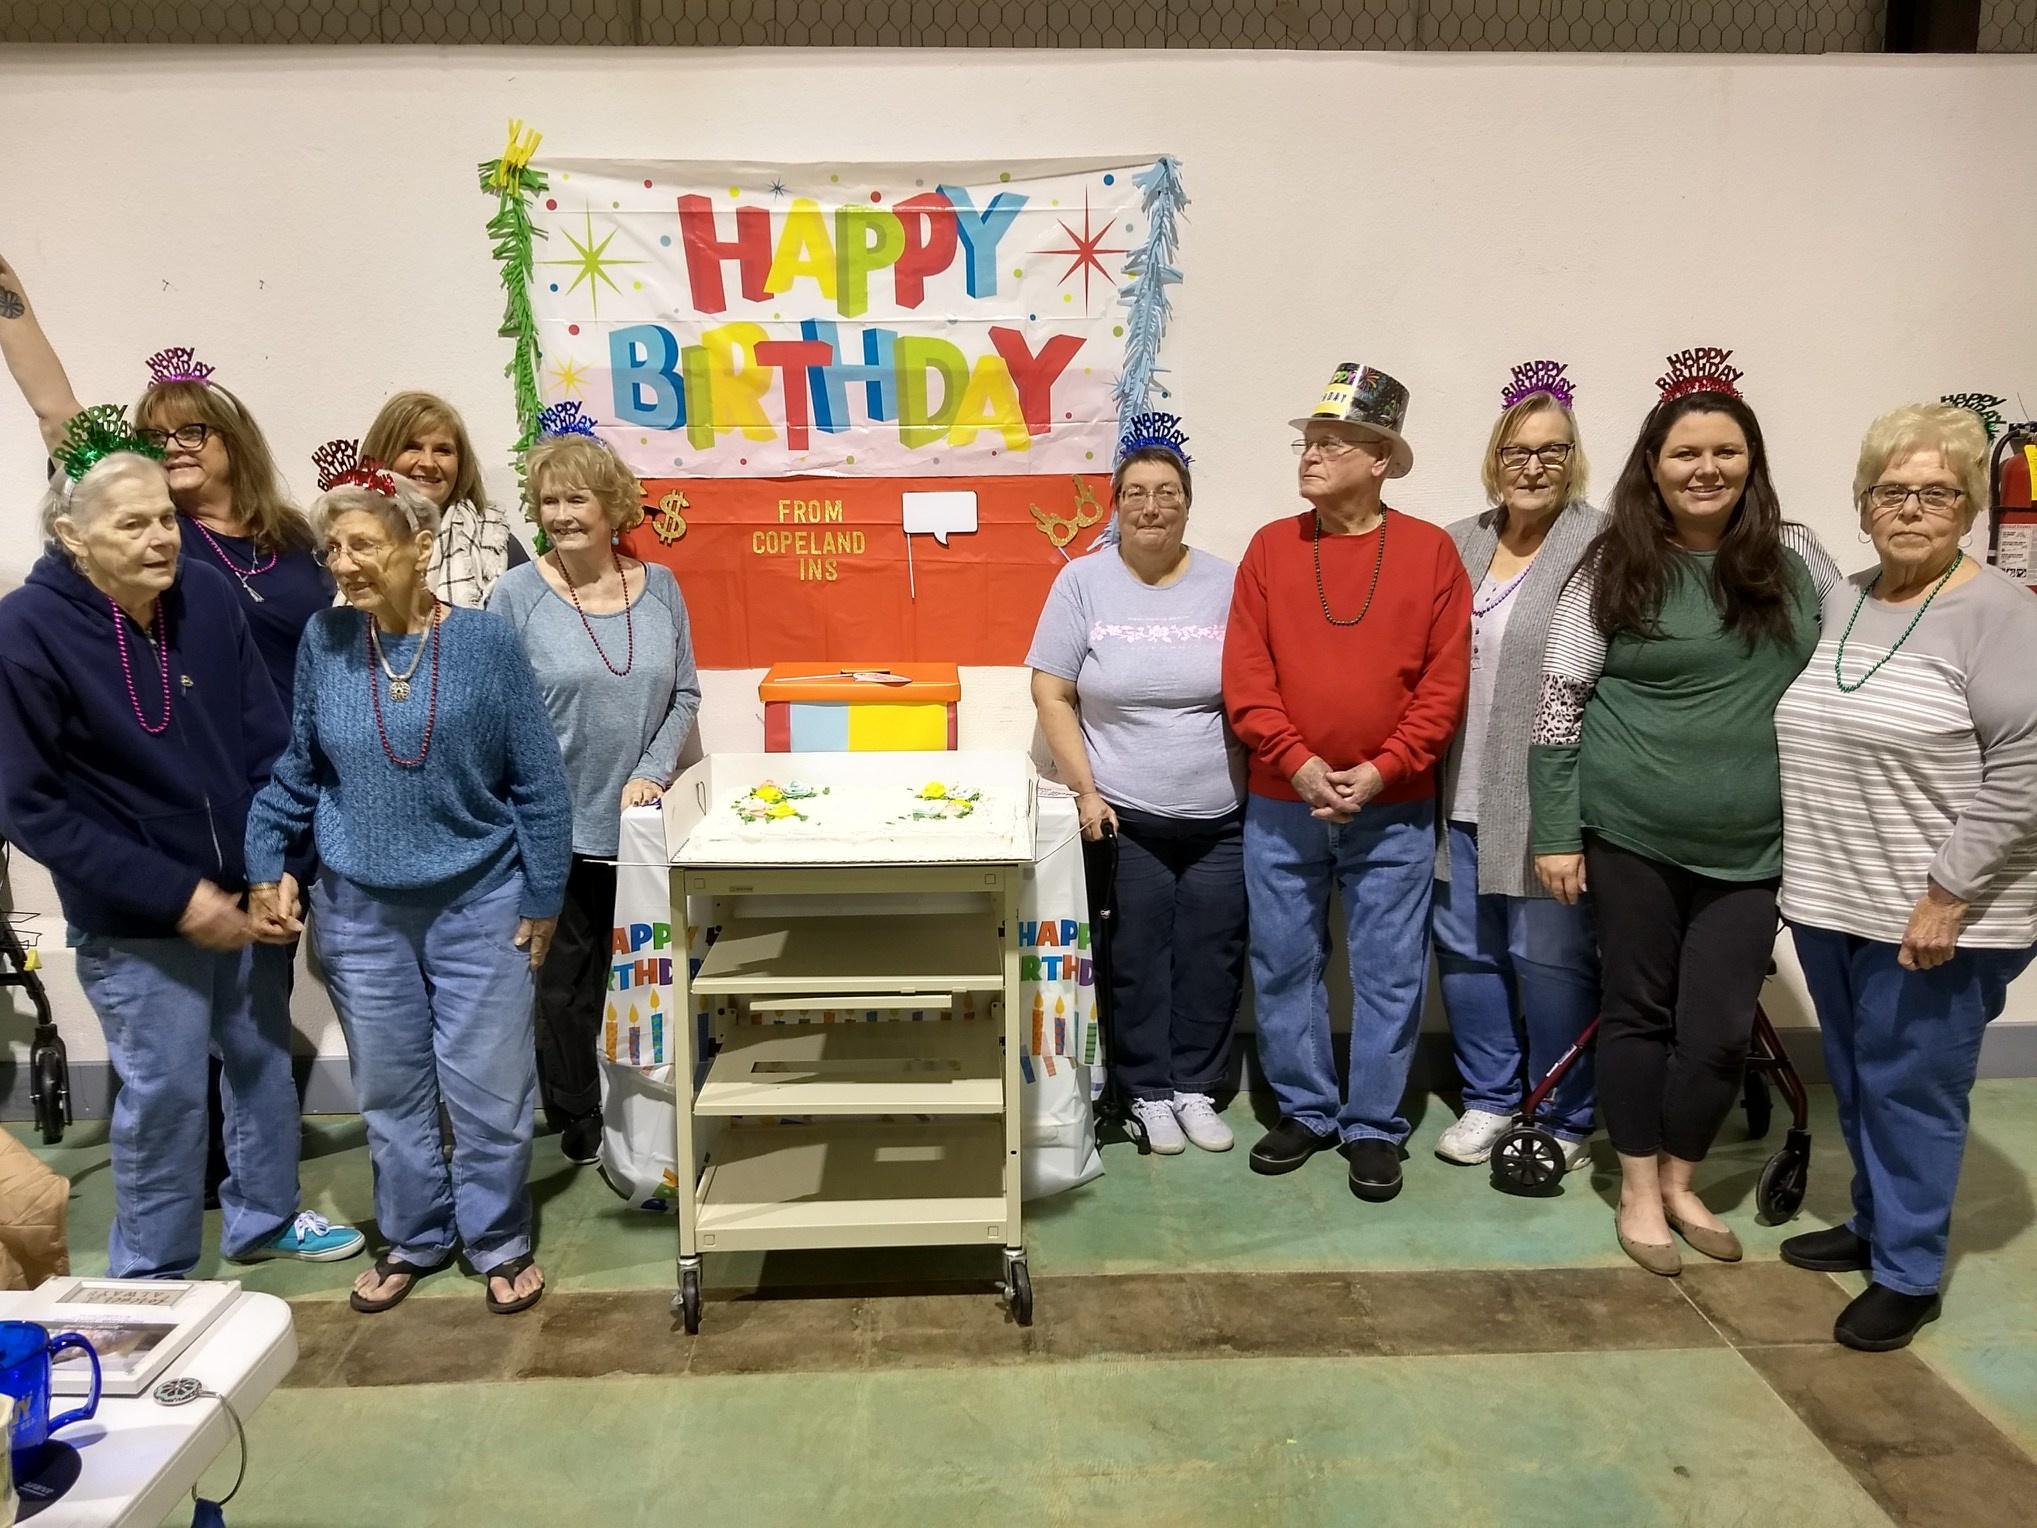 Celebrating January Birthdays at PrimeTime provided by Copeland Insurance.